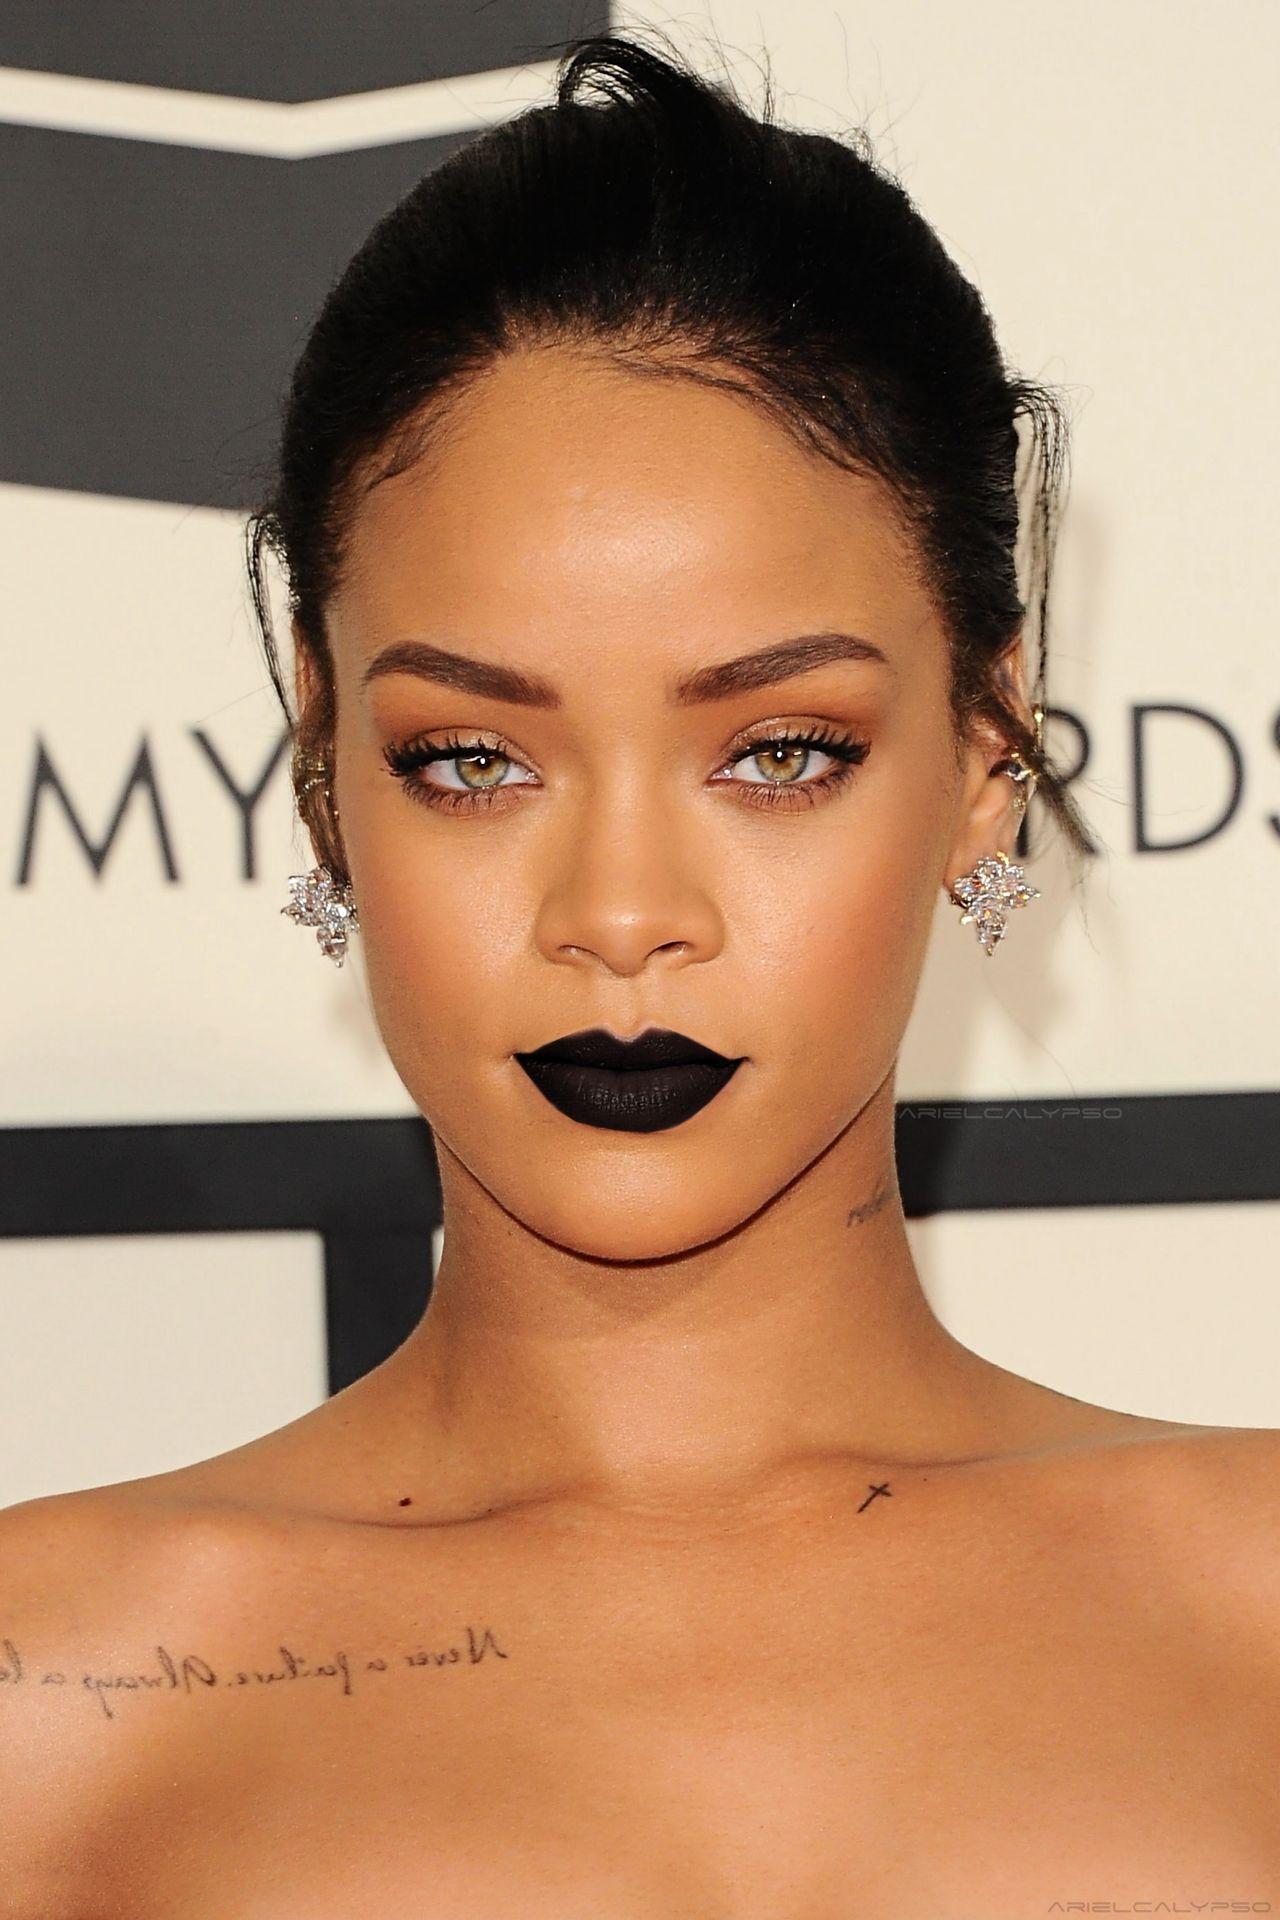 Best of the Week: Rihanna's Orange Lip, Kim Kardashian's Birthday Glam,More Best of the Week: Rihanna's Orange Lip, Kim Kardashian's Birthday Glam,More new foto